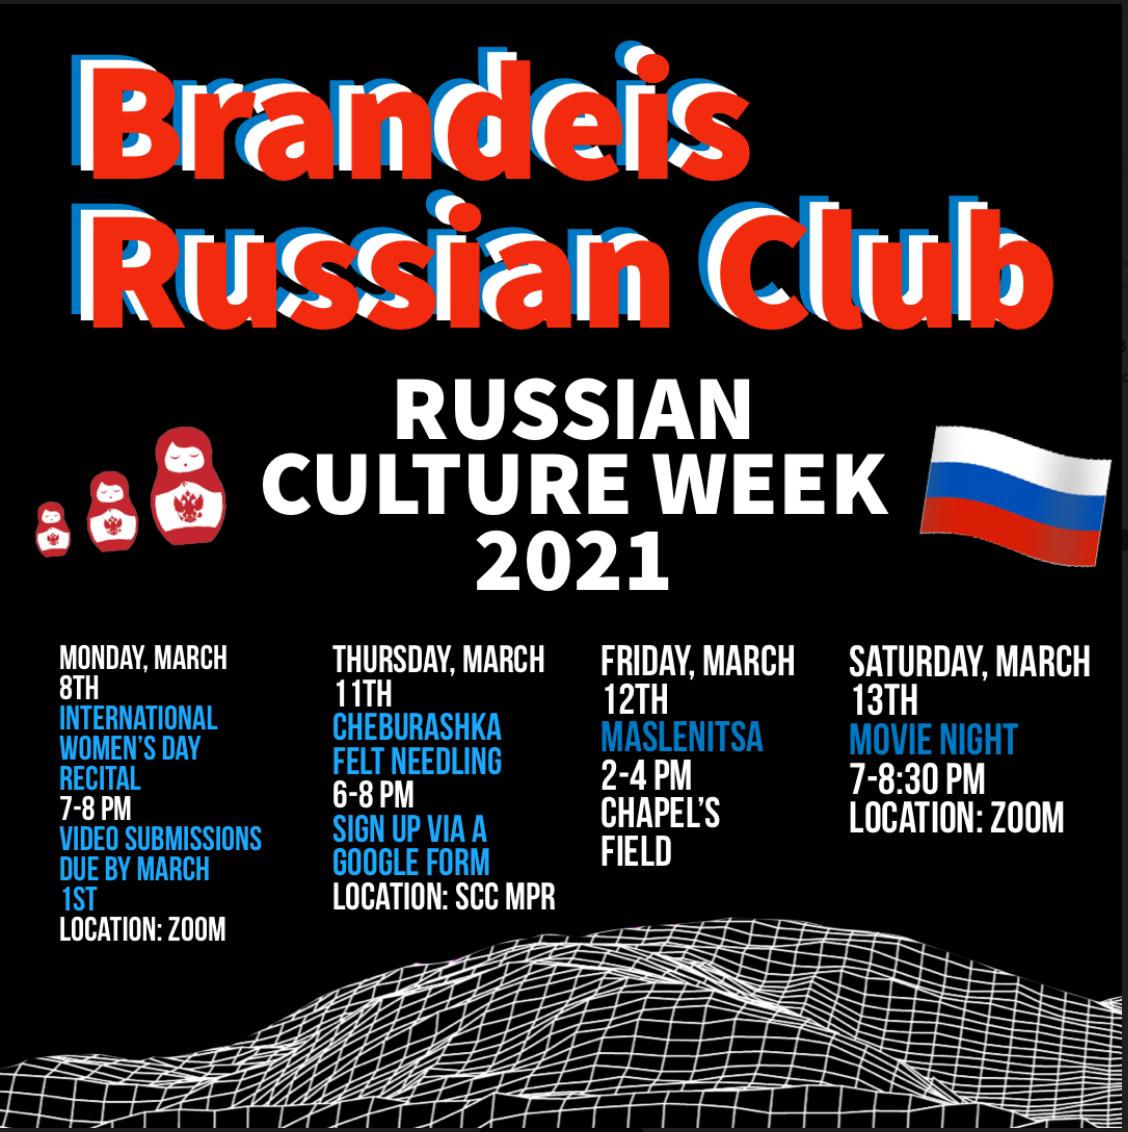 Russian Culture Week 2021